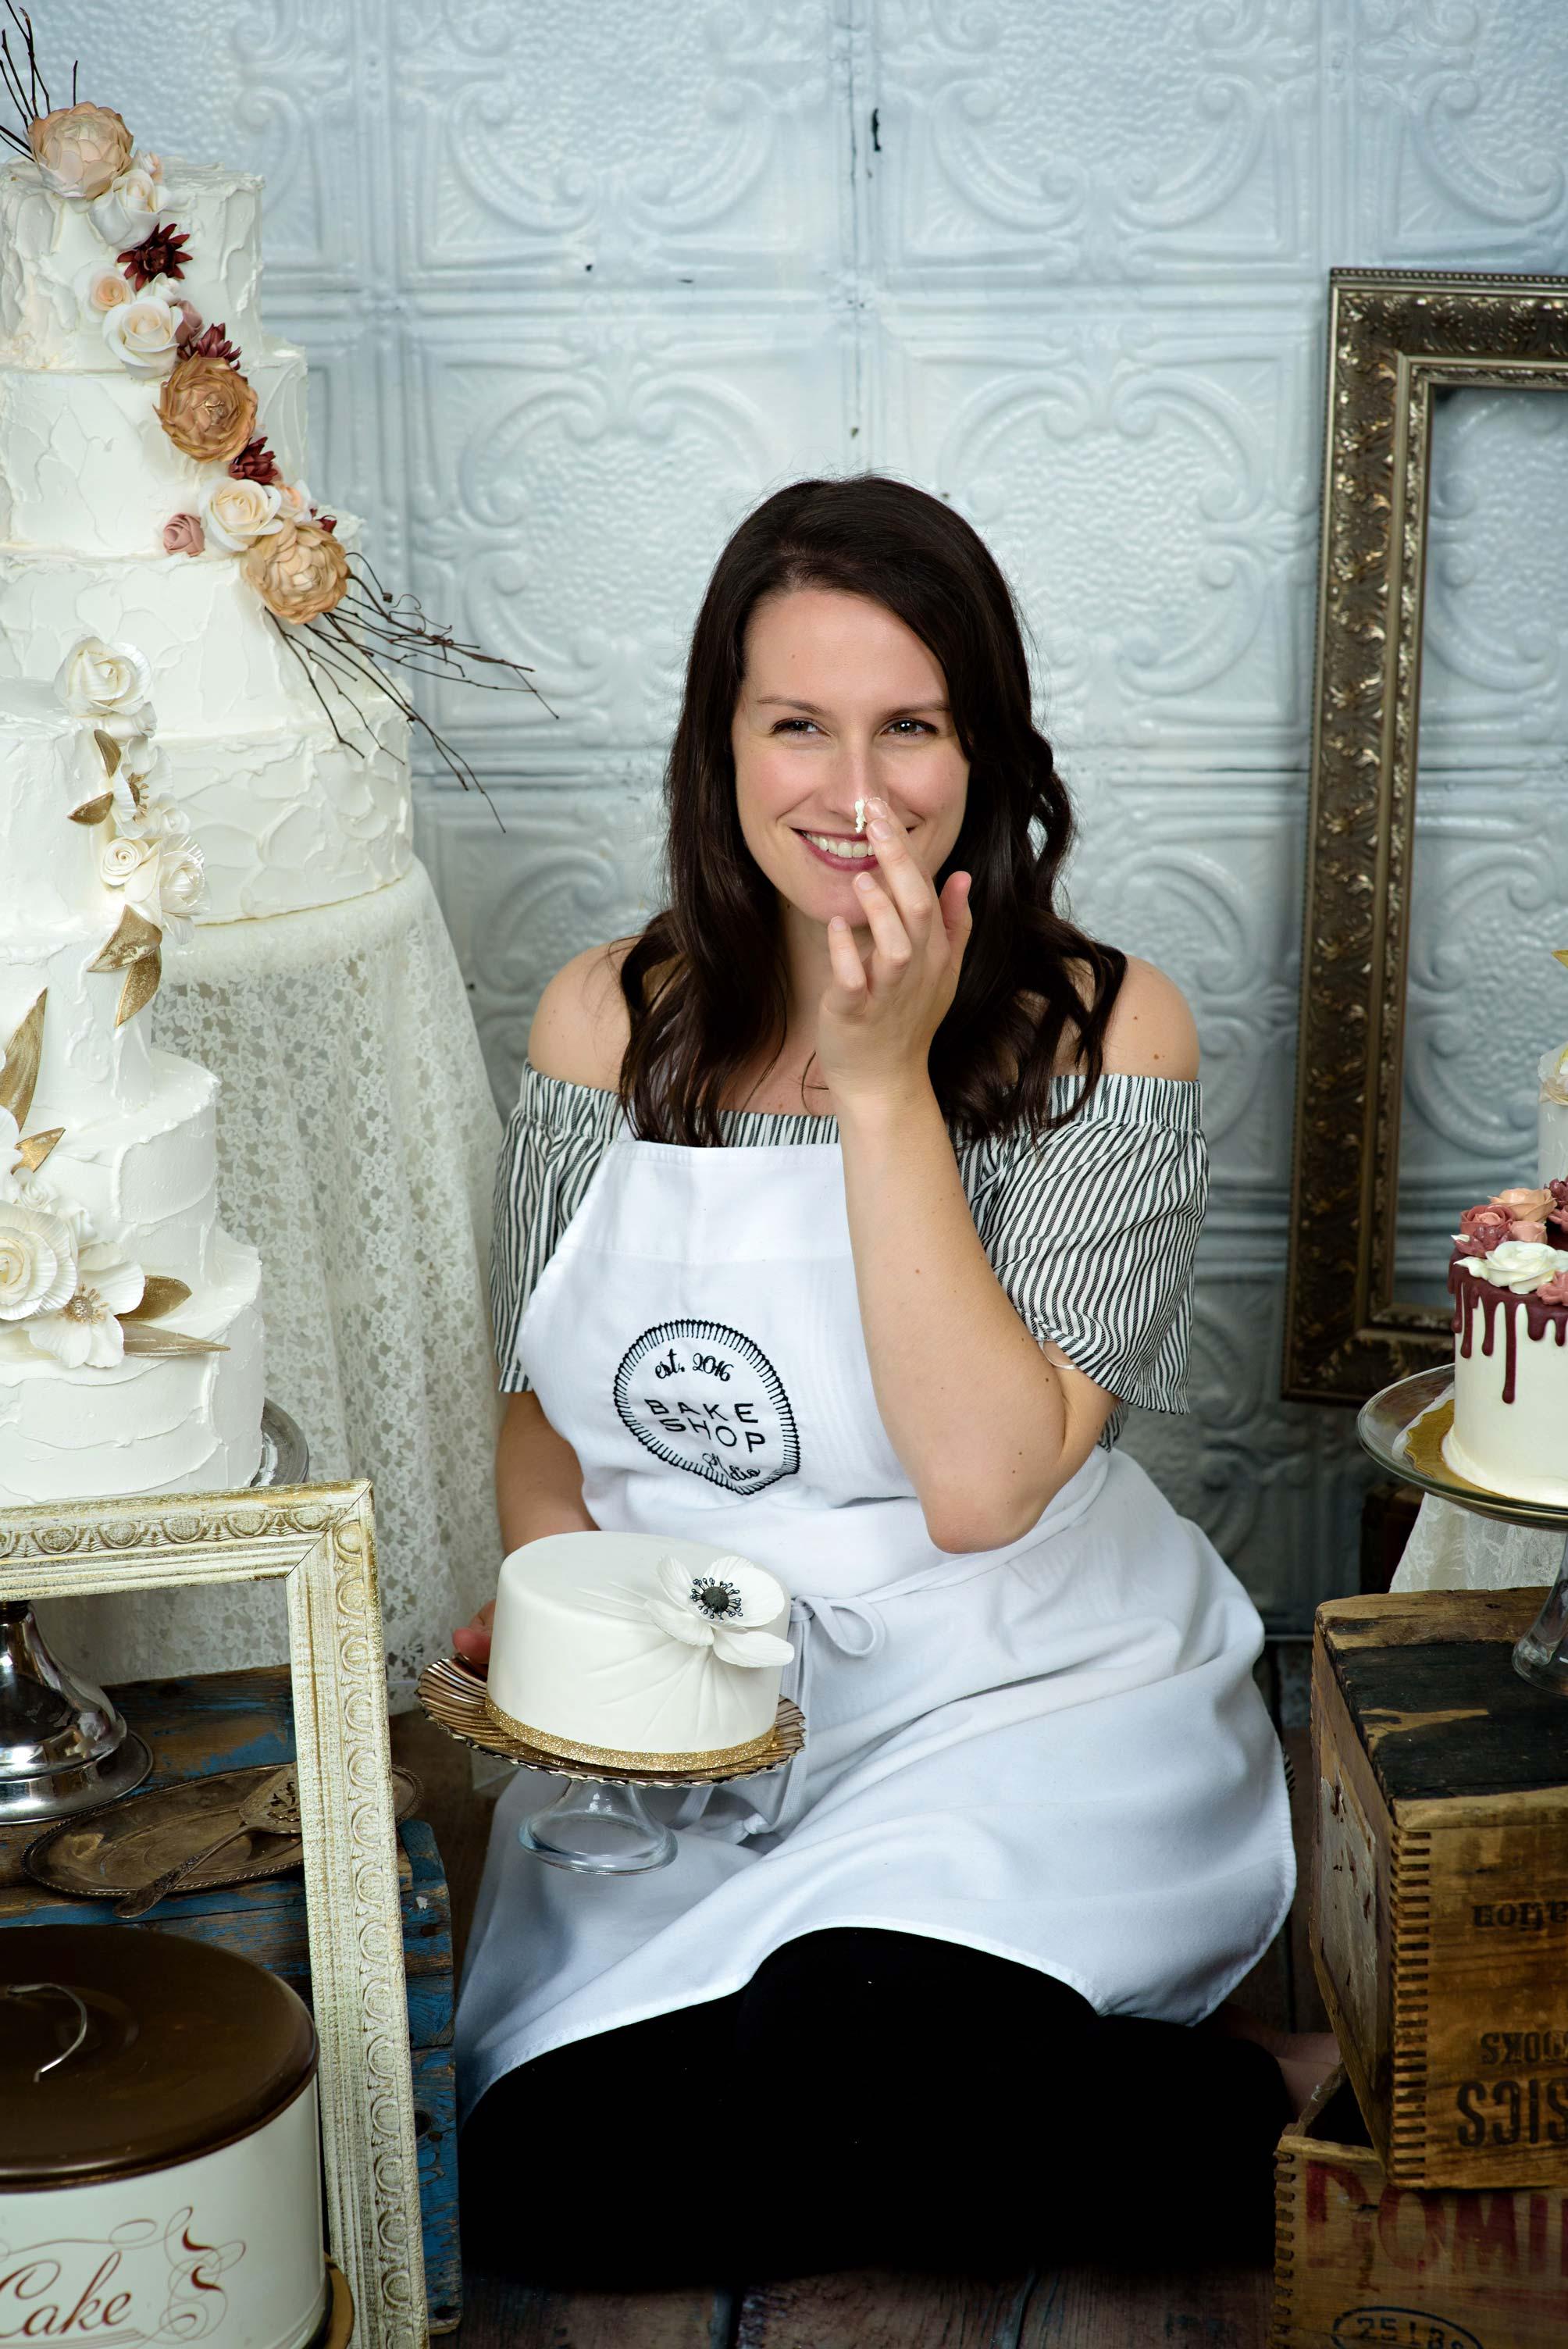 Kate St Laurent | Bake Shop Studio, London ON - Photo Credit HRM Photography INC.